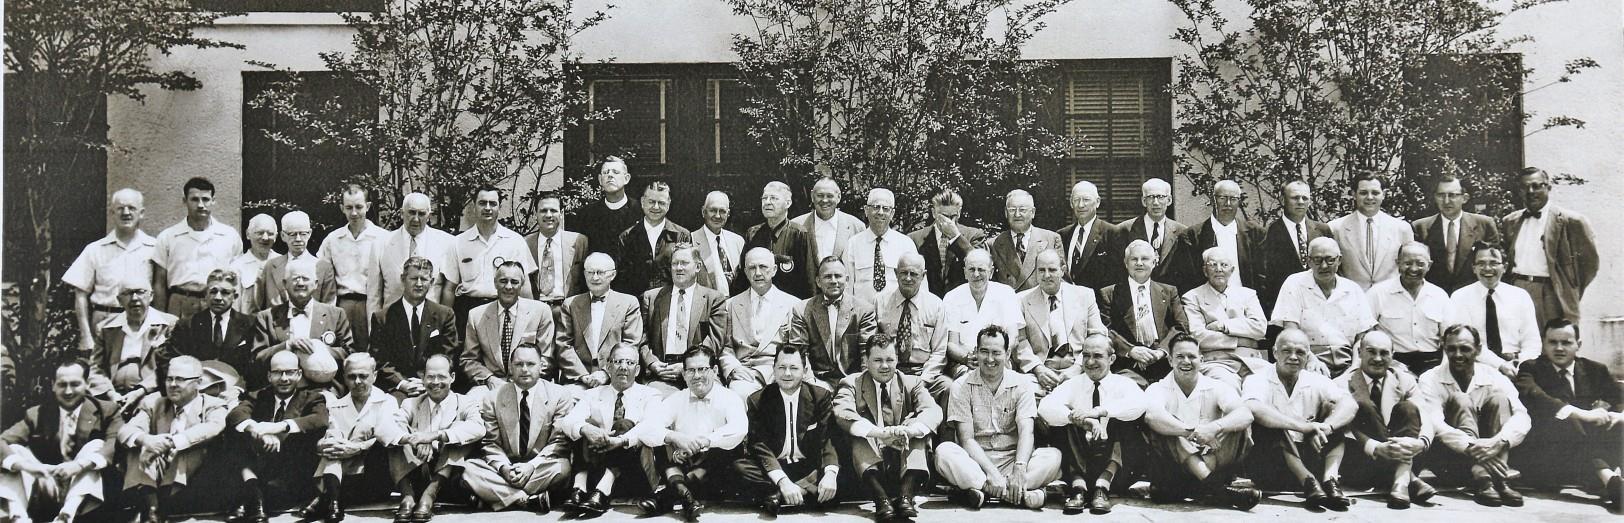 DeLand Rotary Club of 1955